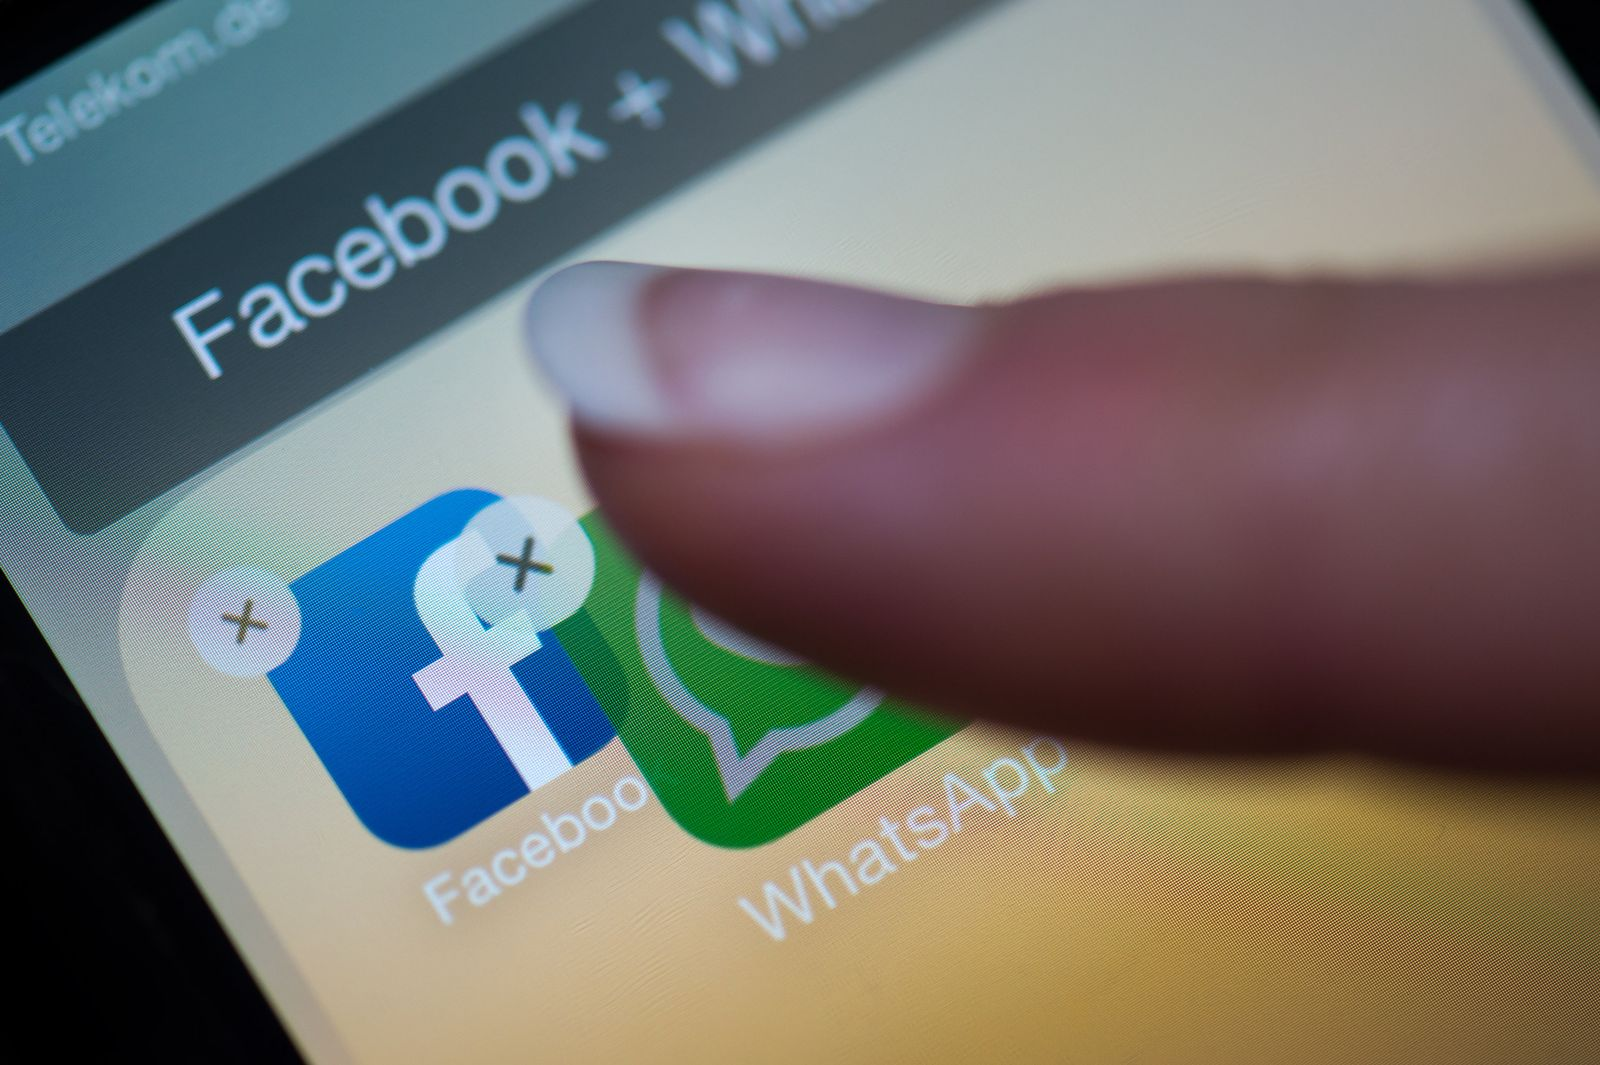 Facebook / WhatsApp